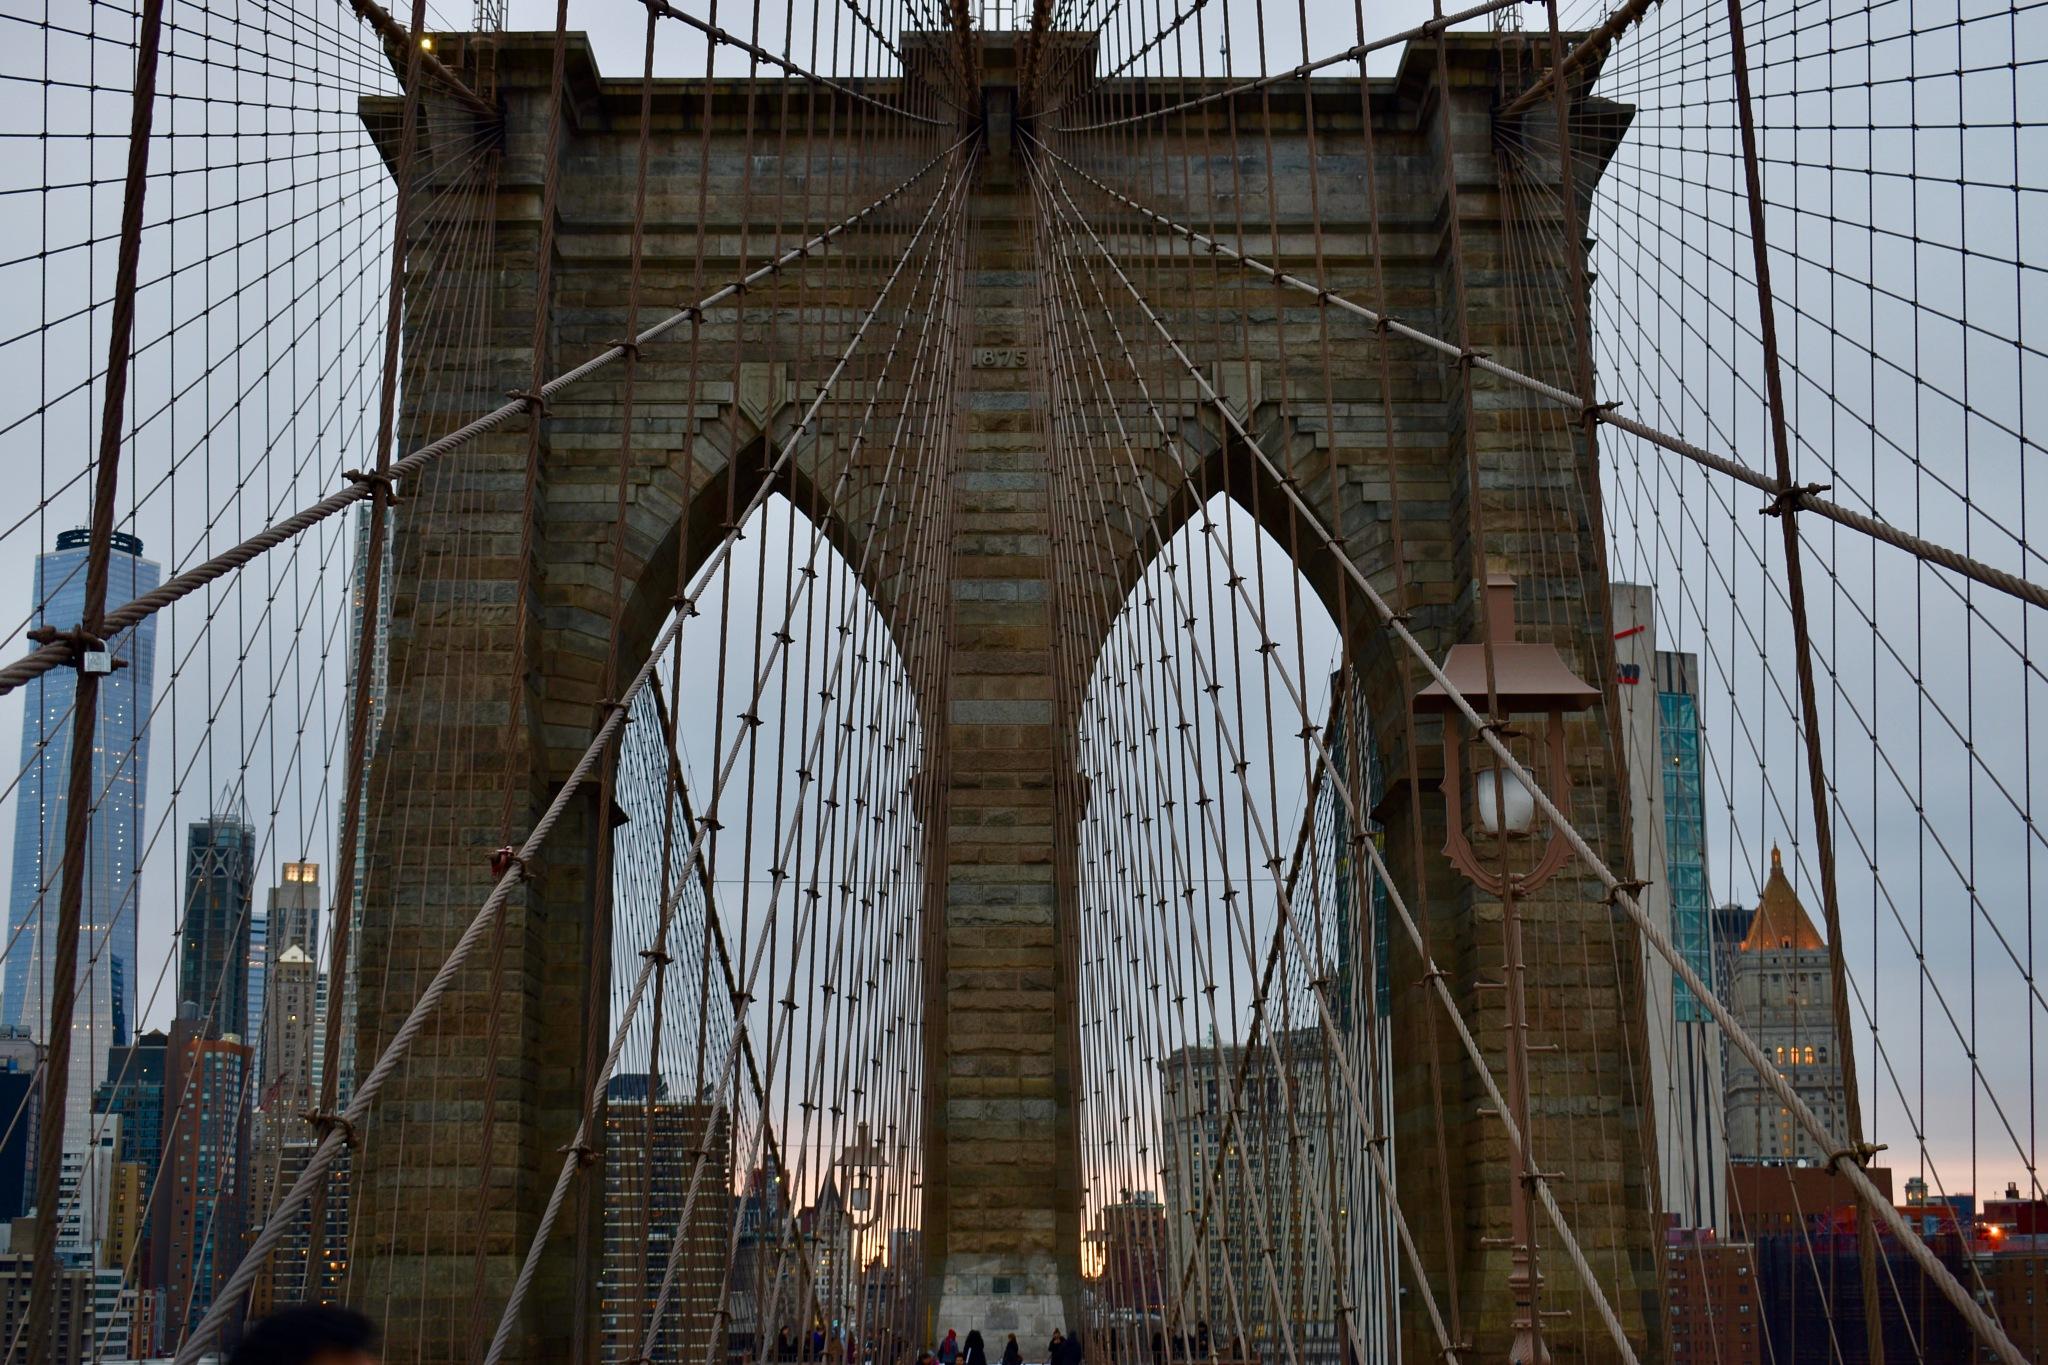 Brooklyn Brooklyn take me in by Sean Helak